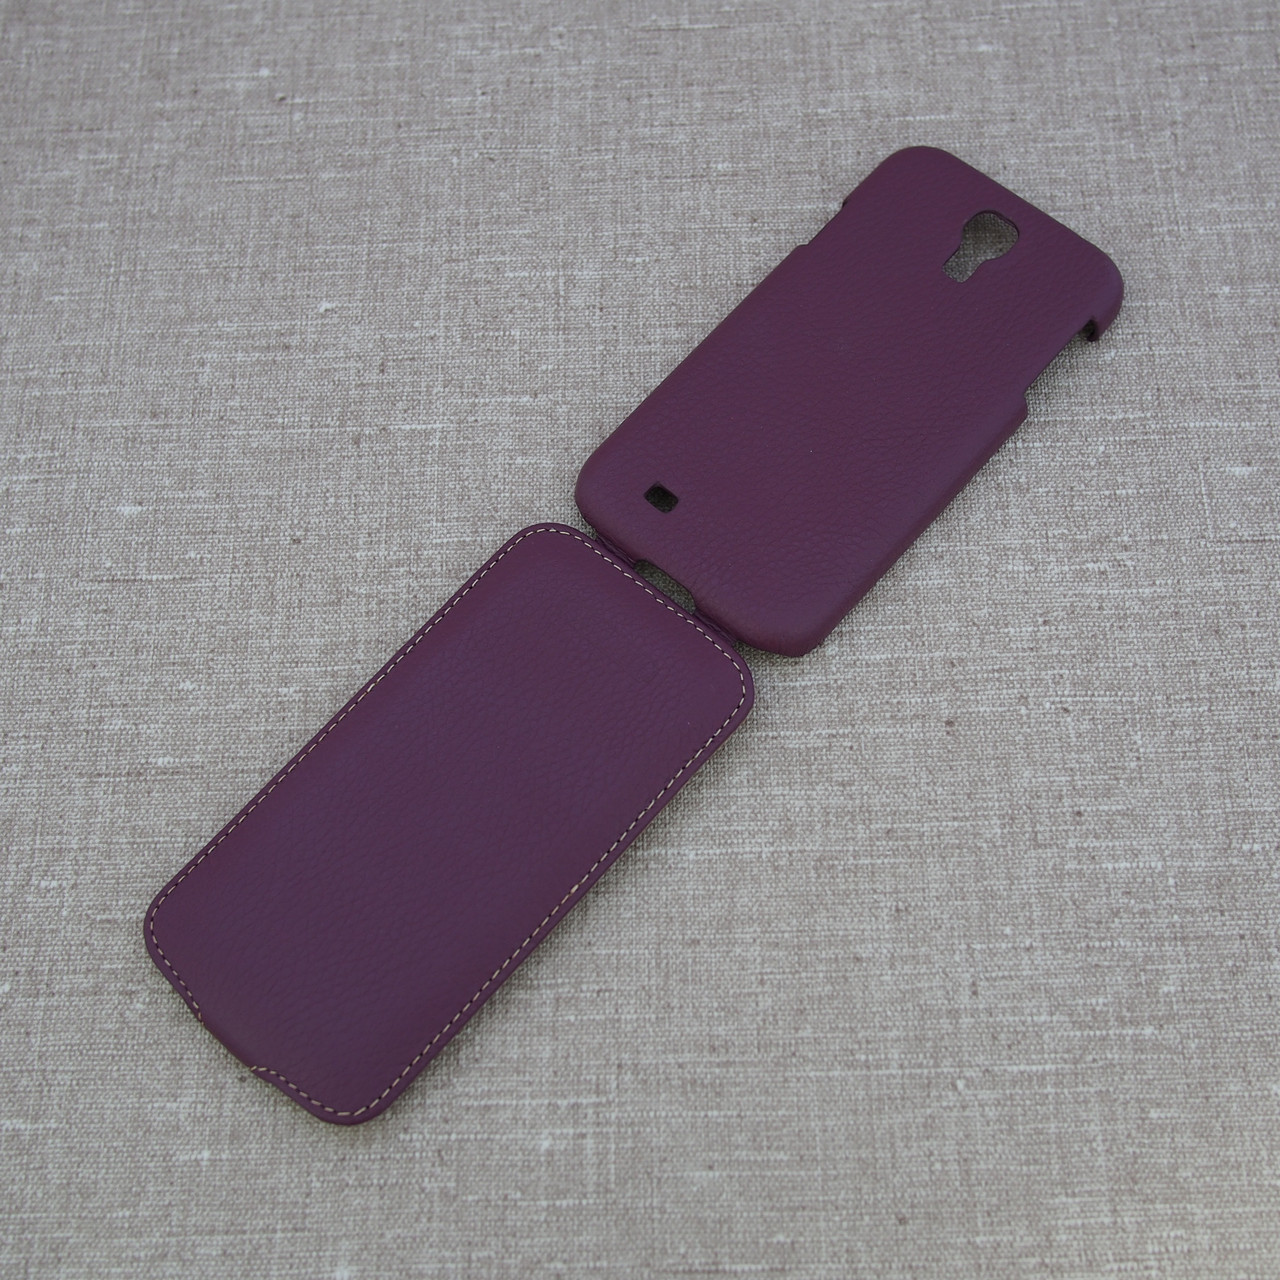 Чехол TETDED Samsung Galaxy S4 purple Для телефона Tetded